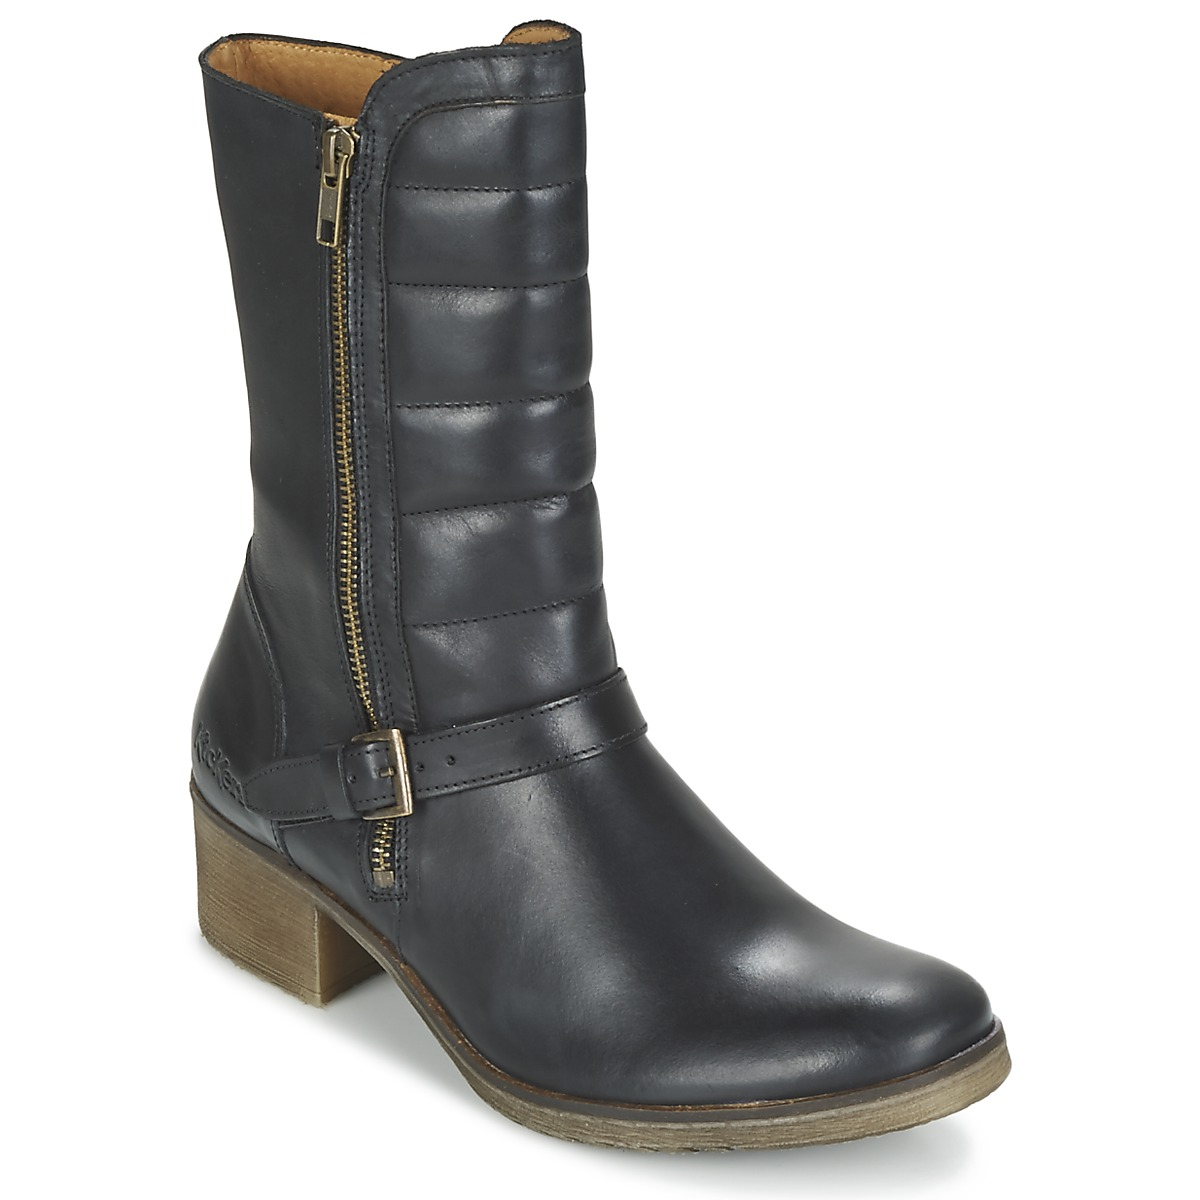 1b5149923876cd Chaussures, Sacs, KICKERS femme - Chaussure pas cher avec Shoes.fr